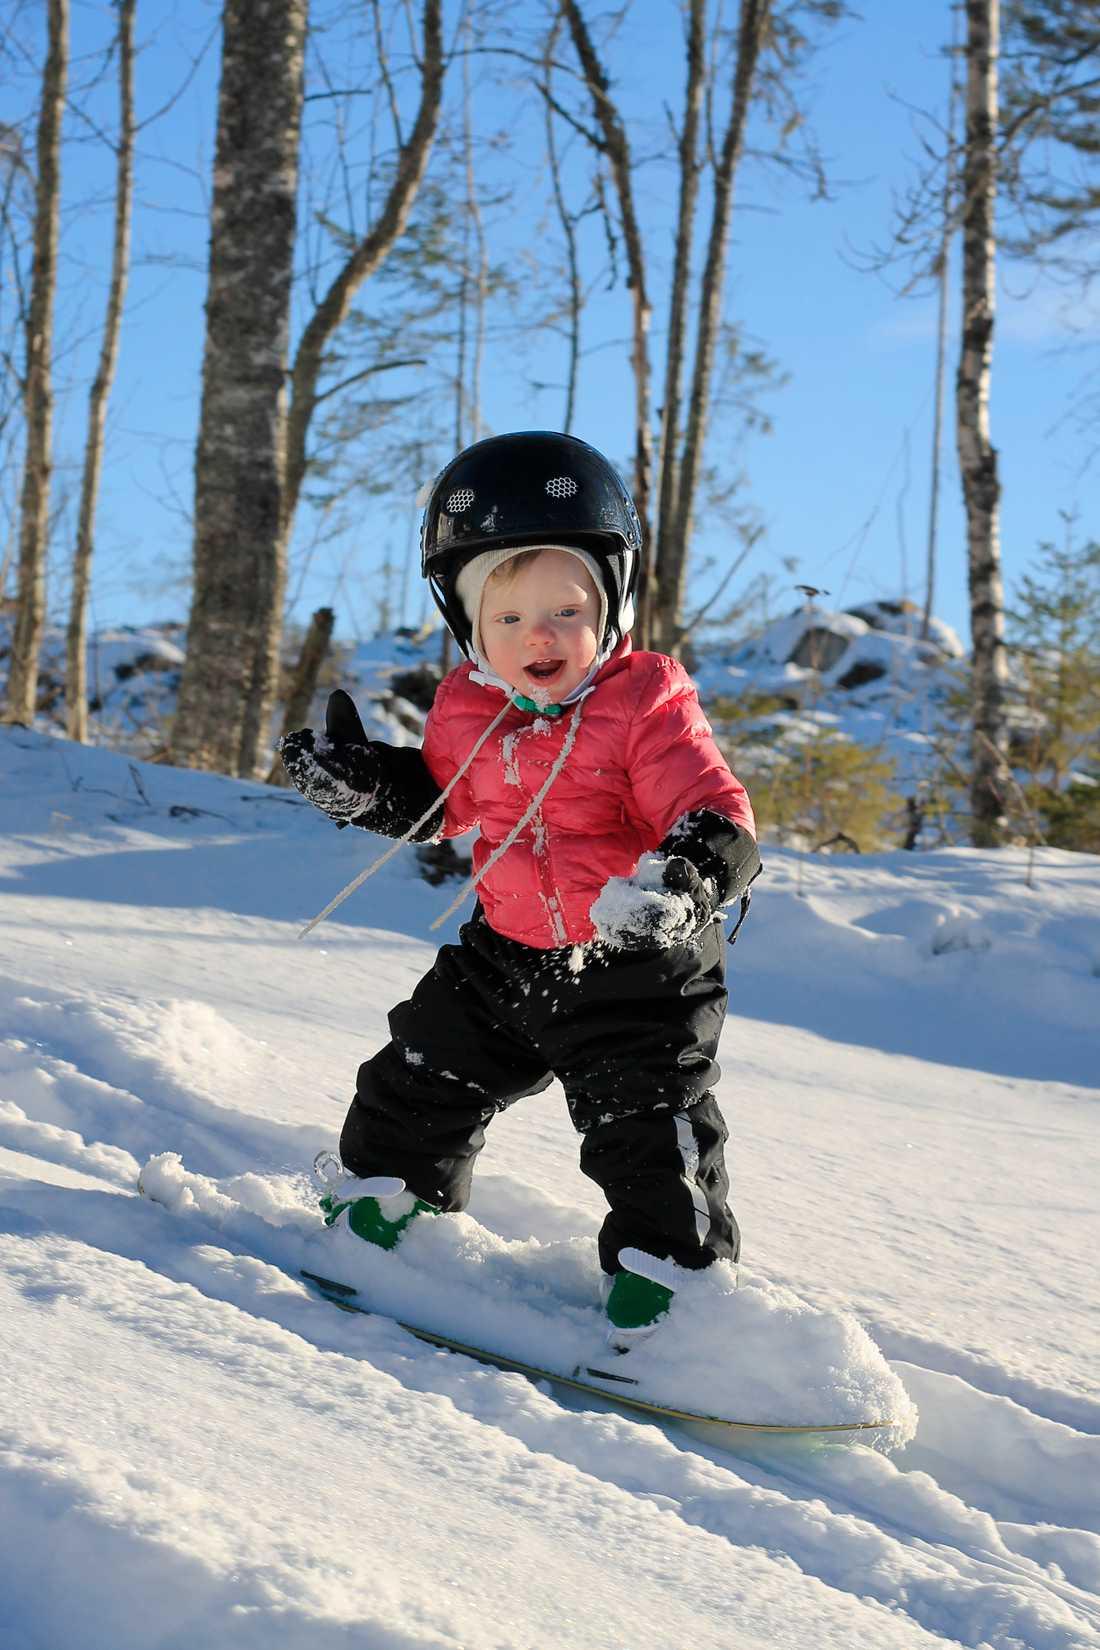 Elly fick sin snowboard i ettårspresent.